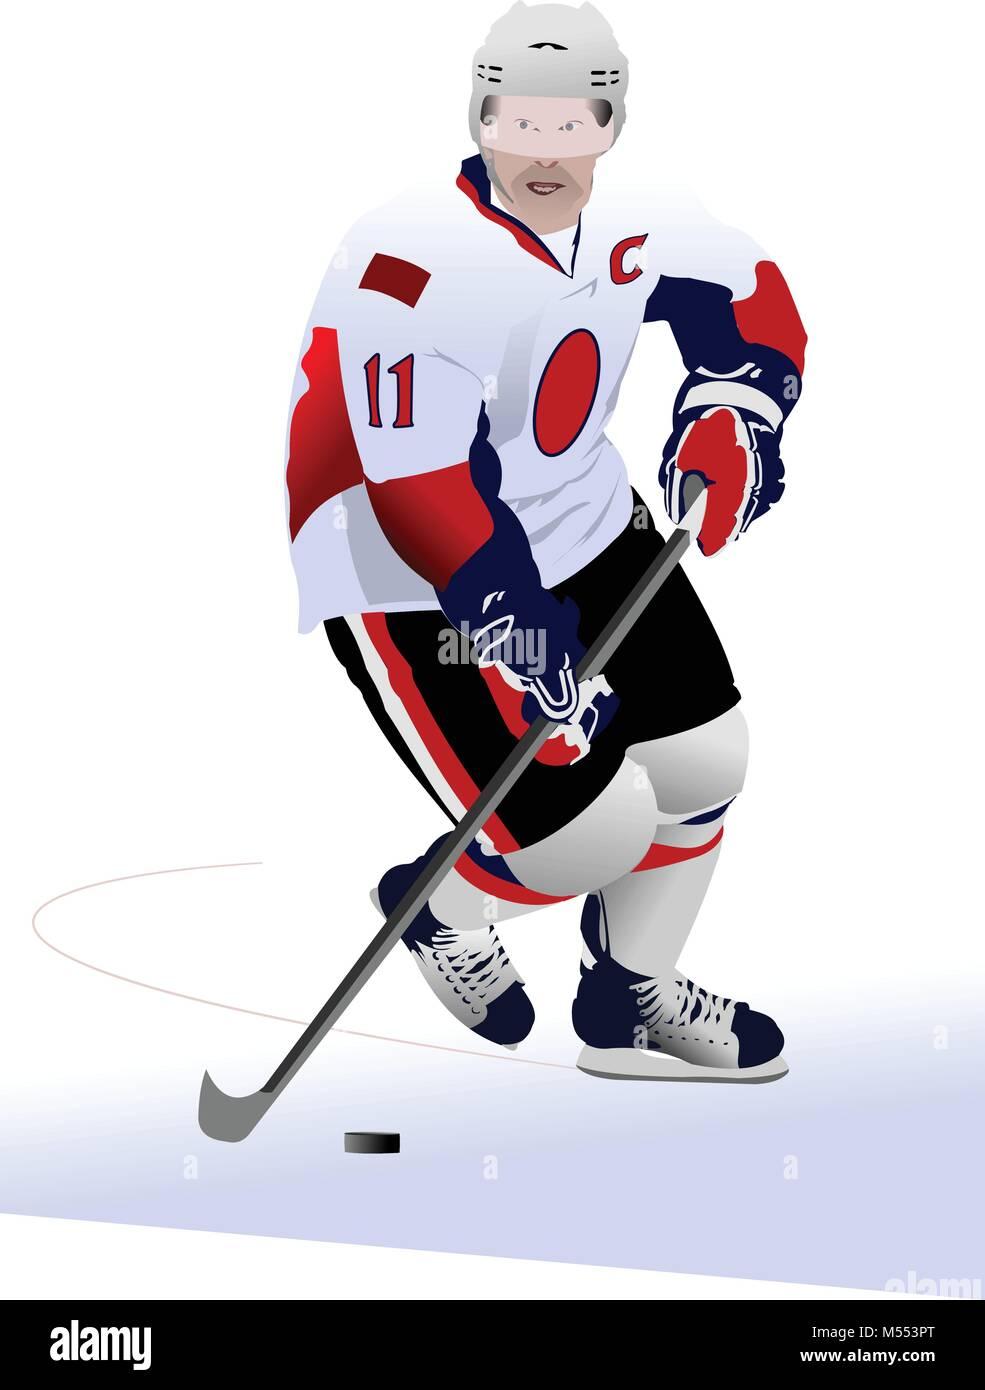 Ice hockey players. Vector illustration - Stock Vector